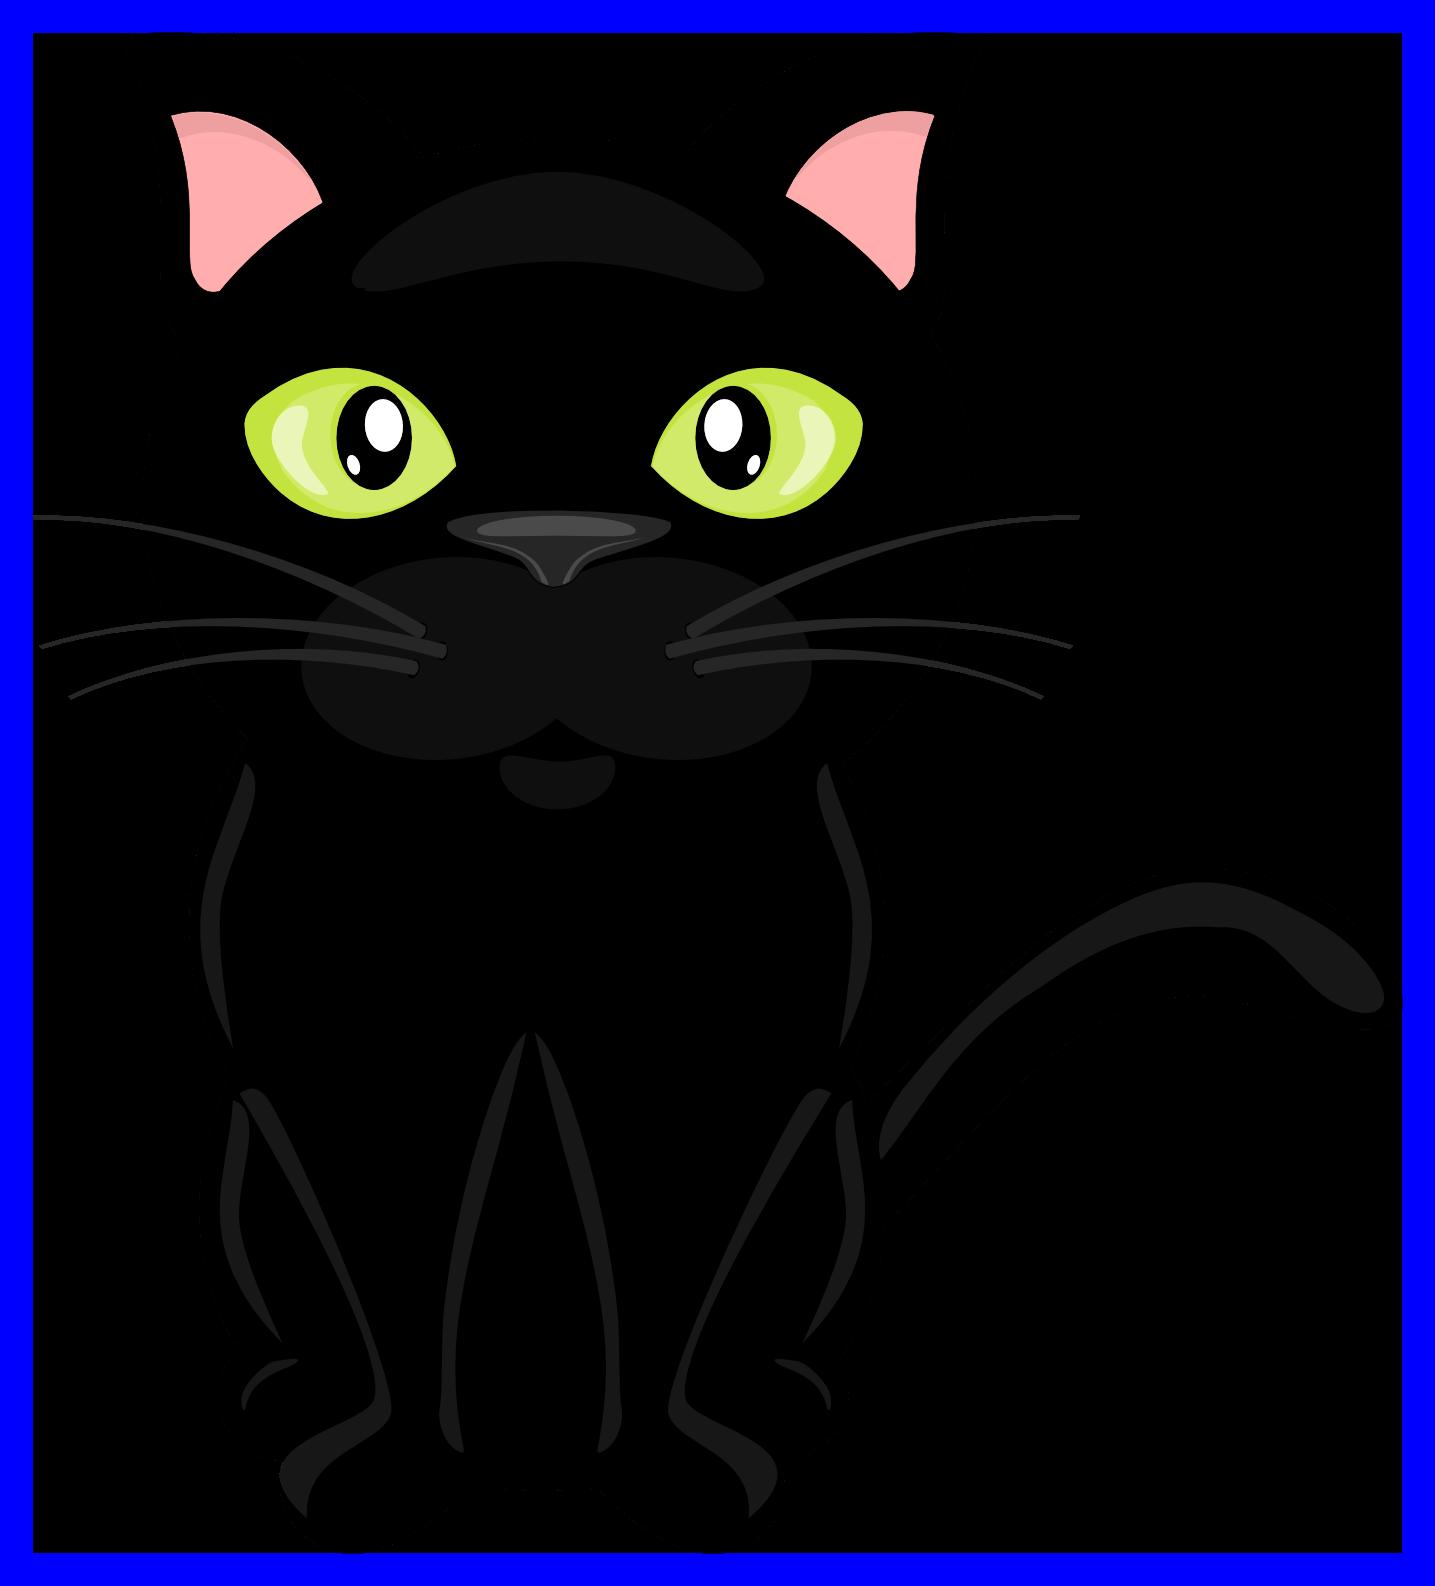 Cute halloween cat clipart clipart royalty free Cute Halloween Cat Pictures - Free Cute Cat Wallpapers clipart royalty free